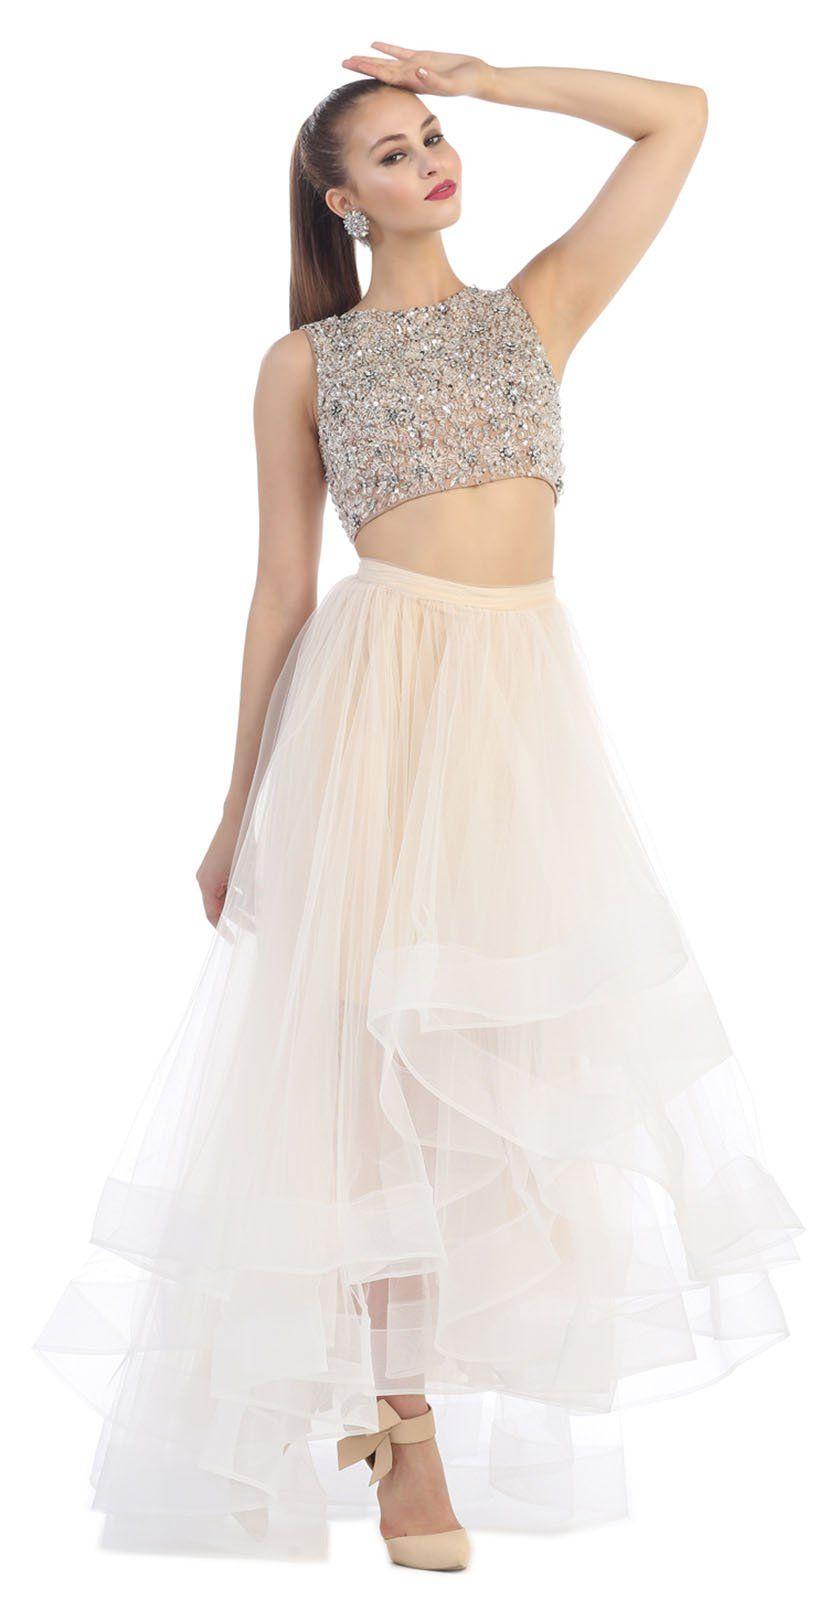 23603474a04 Royal Queen RQ7398 Two Piece Semi Formal Dance Dress (8